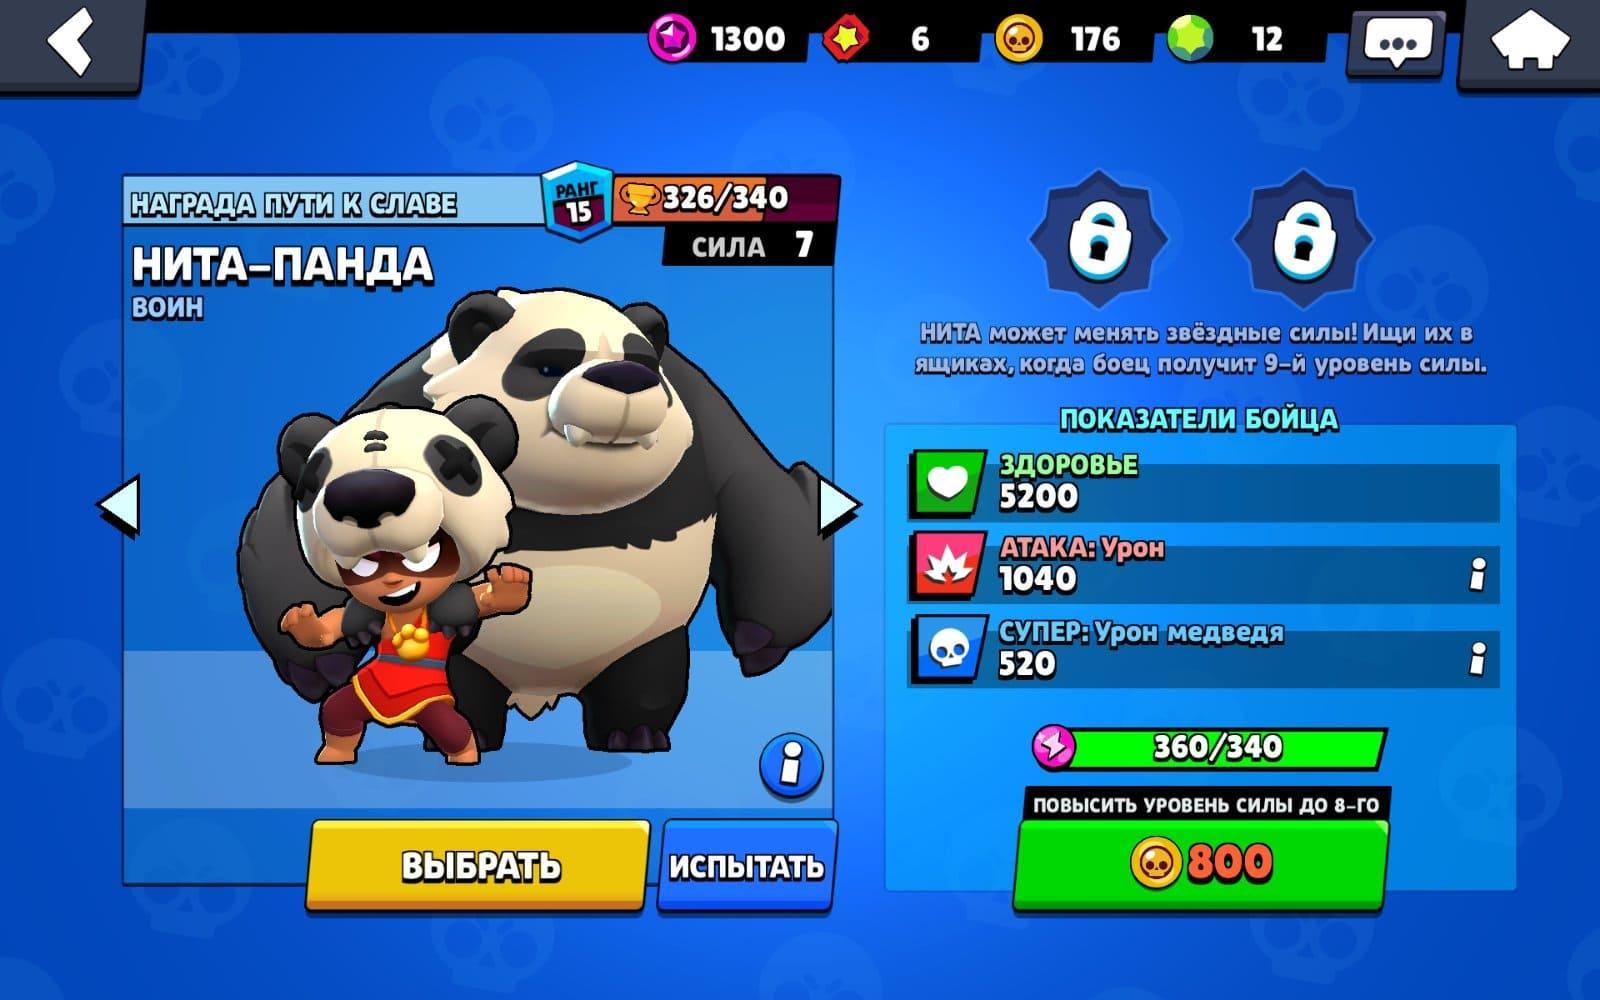 Скин воина Нита-Панда с медведем